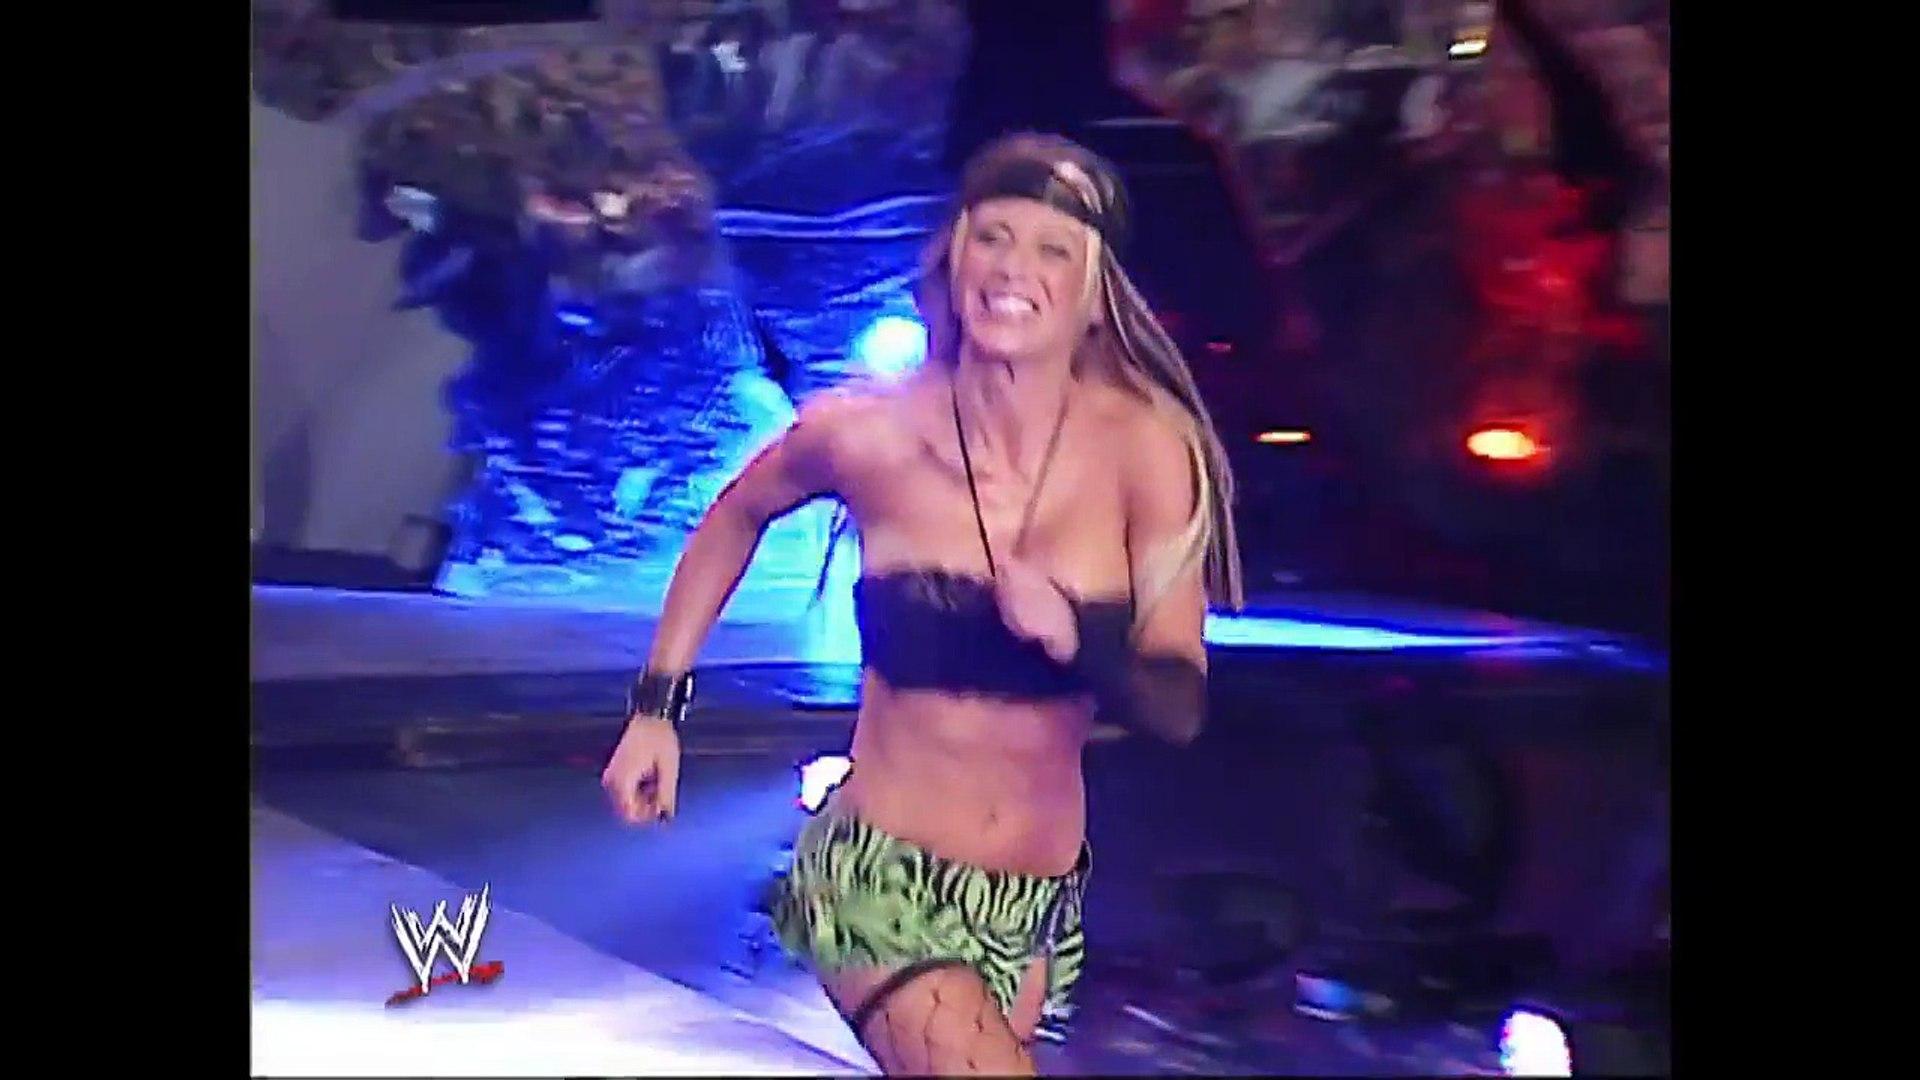 Brian Kendrick & Paul London vs Gregory Helms & Chavo Guerrero SmackDown 04.06.2007